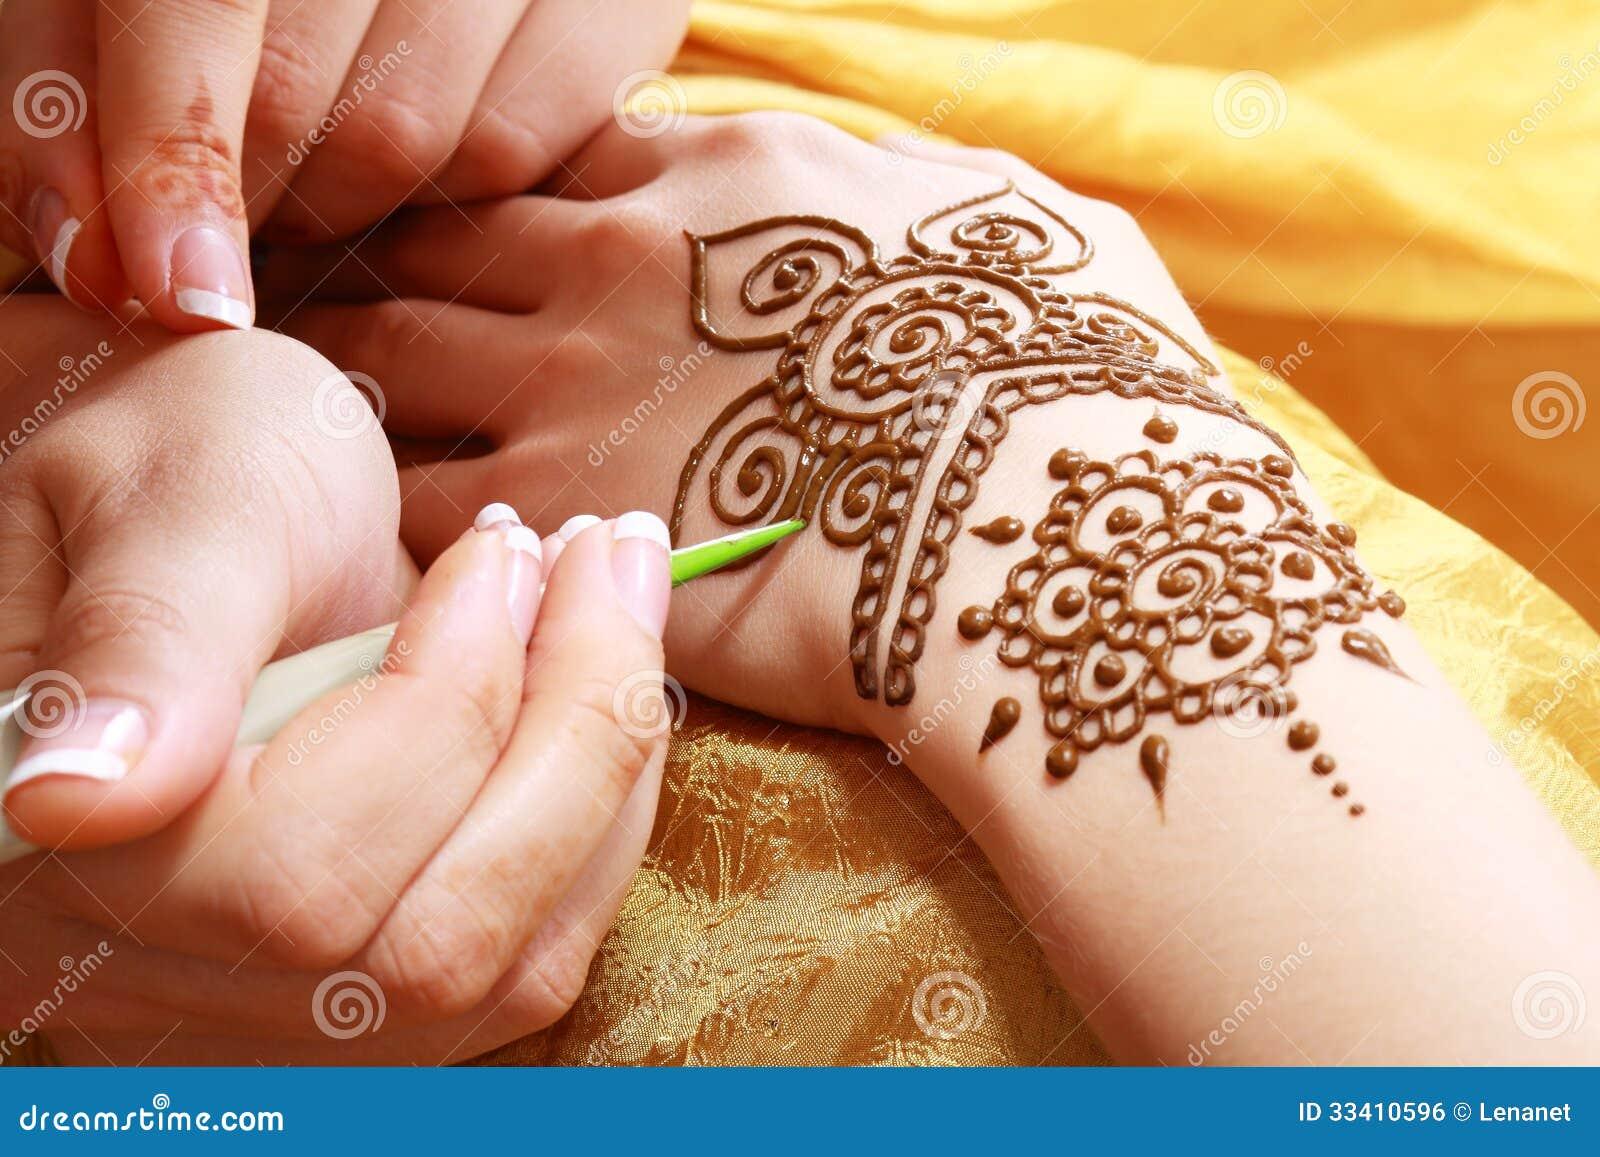 Apply Mehndi Hands : Henna applying royalty free stock image